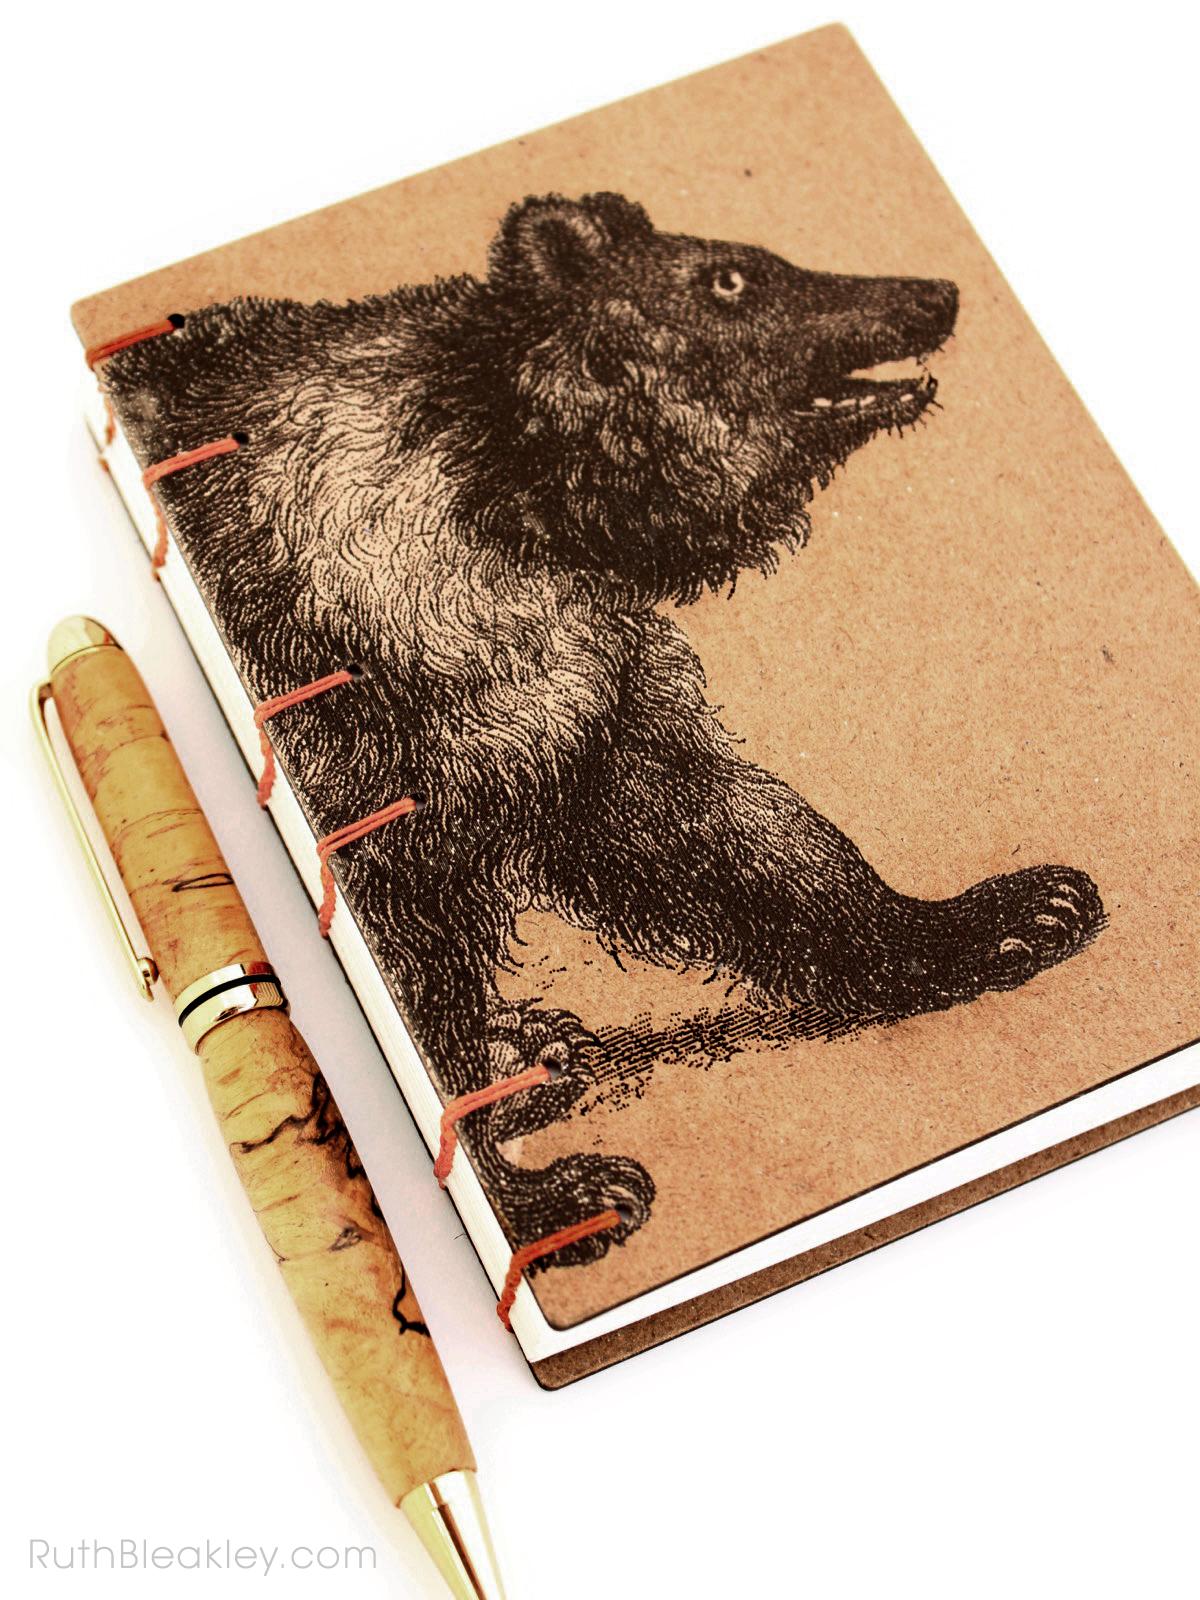 Bear Journal handmade by American book artist Ruth Bleakley - 3